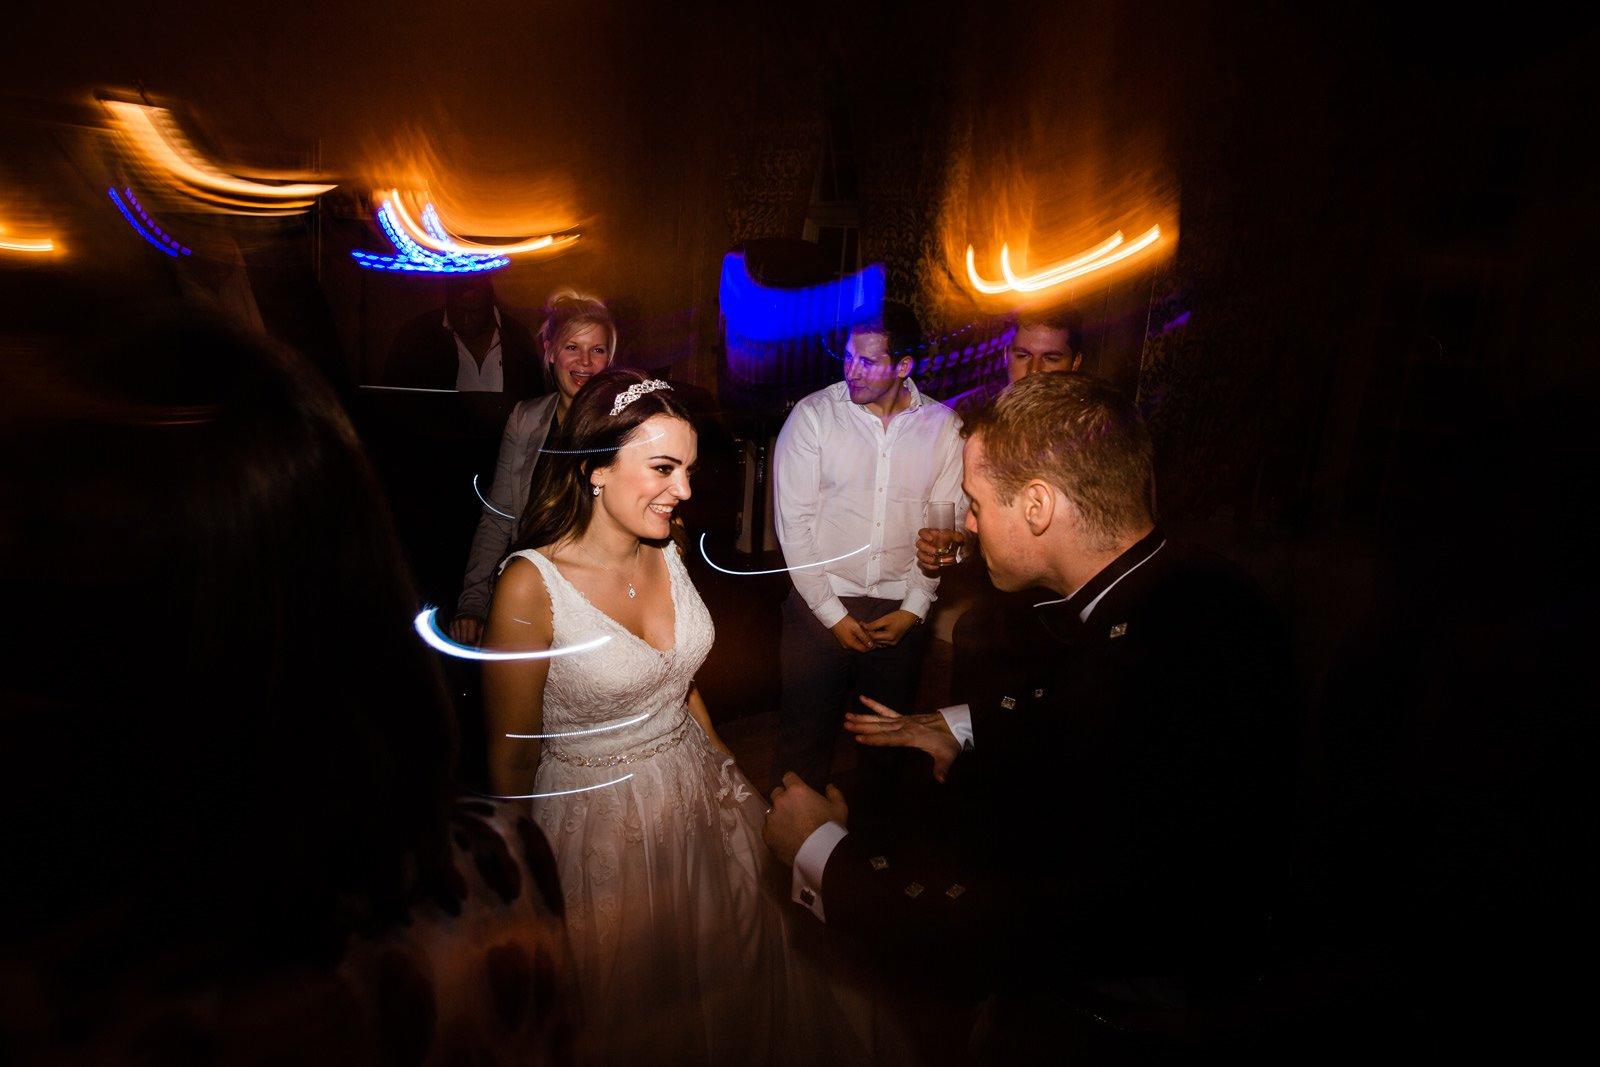 tylney hall wedding photos 59